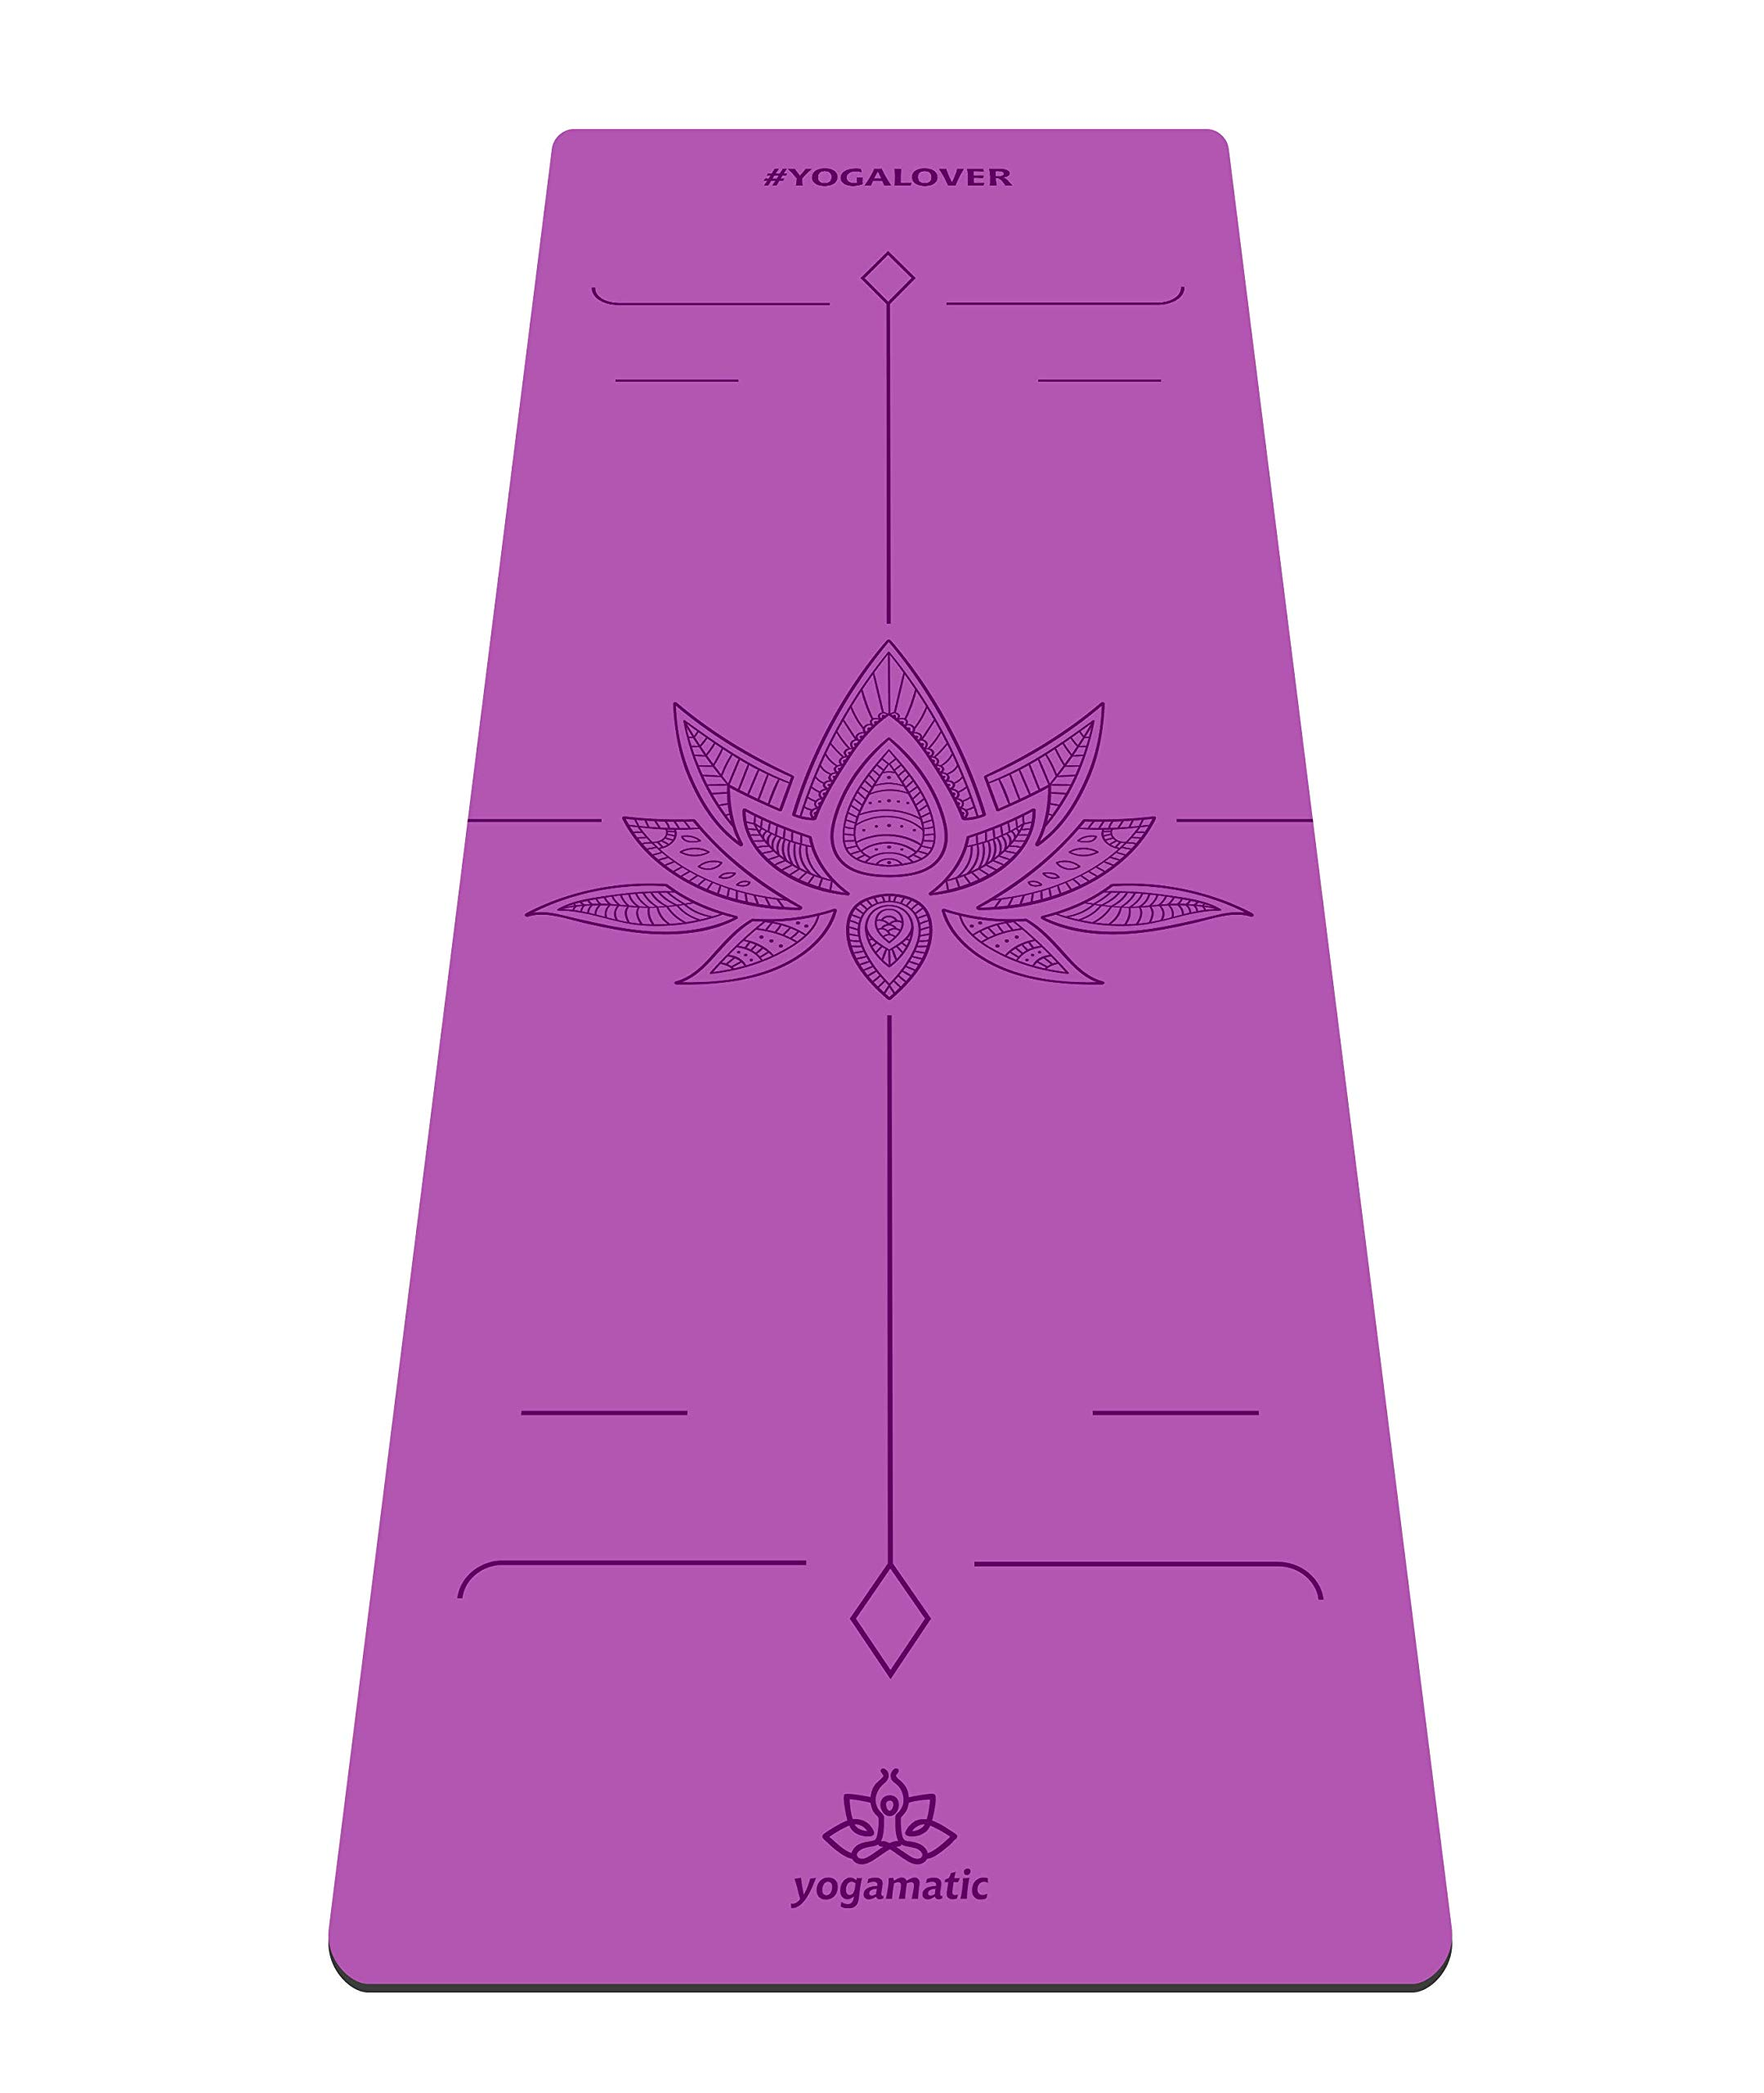 ARTMATIC Premium Eco Friendly Yoga Mat - Hamsa Grey / Natural rubber base + Non slip top / The best GripForMe system / With Original Unique Alignment (Yoga Lover Purple)